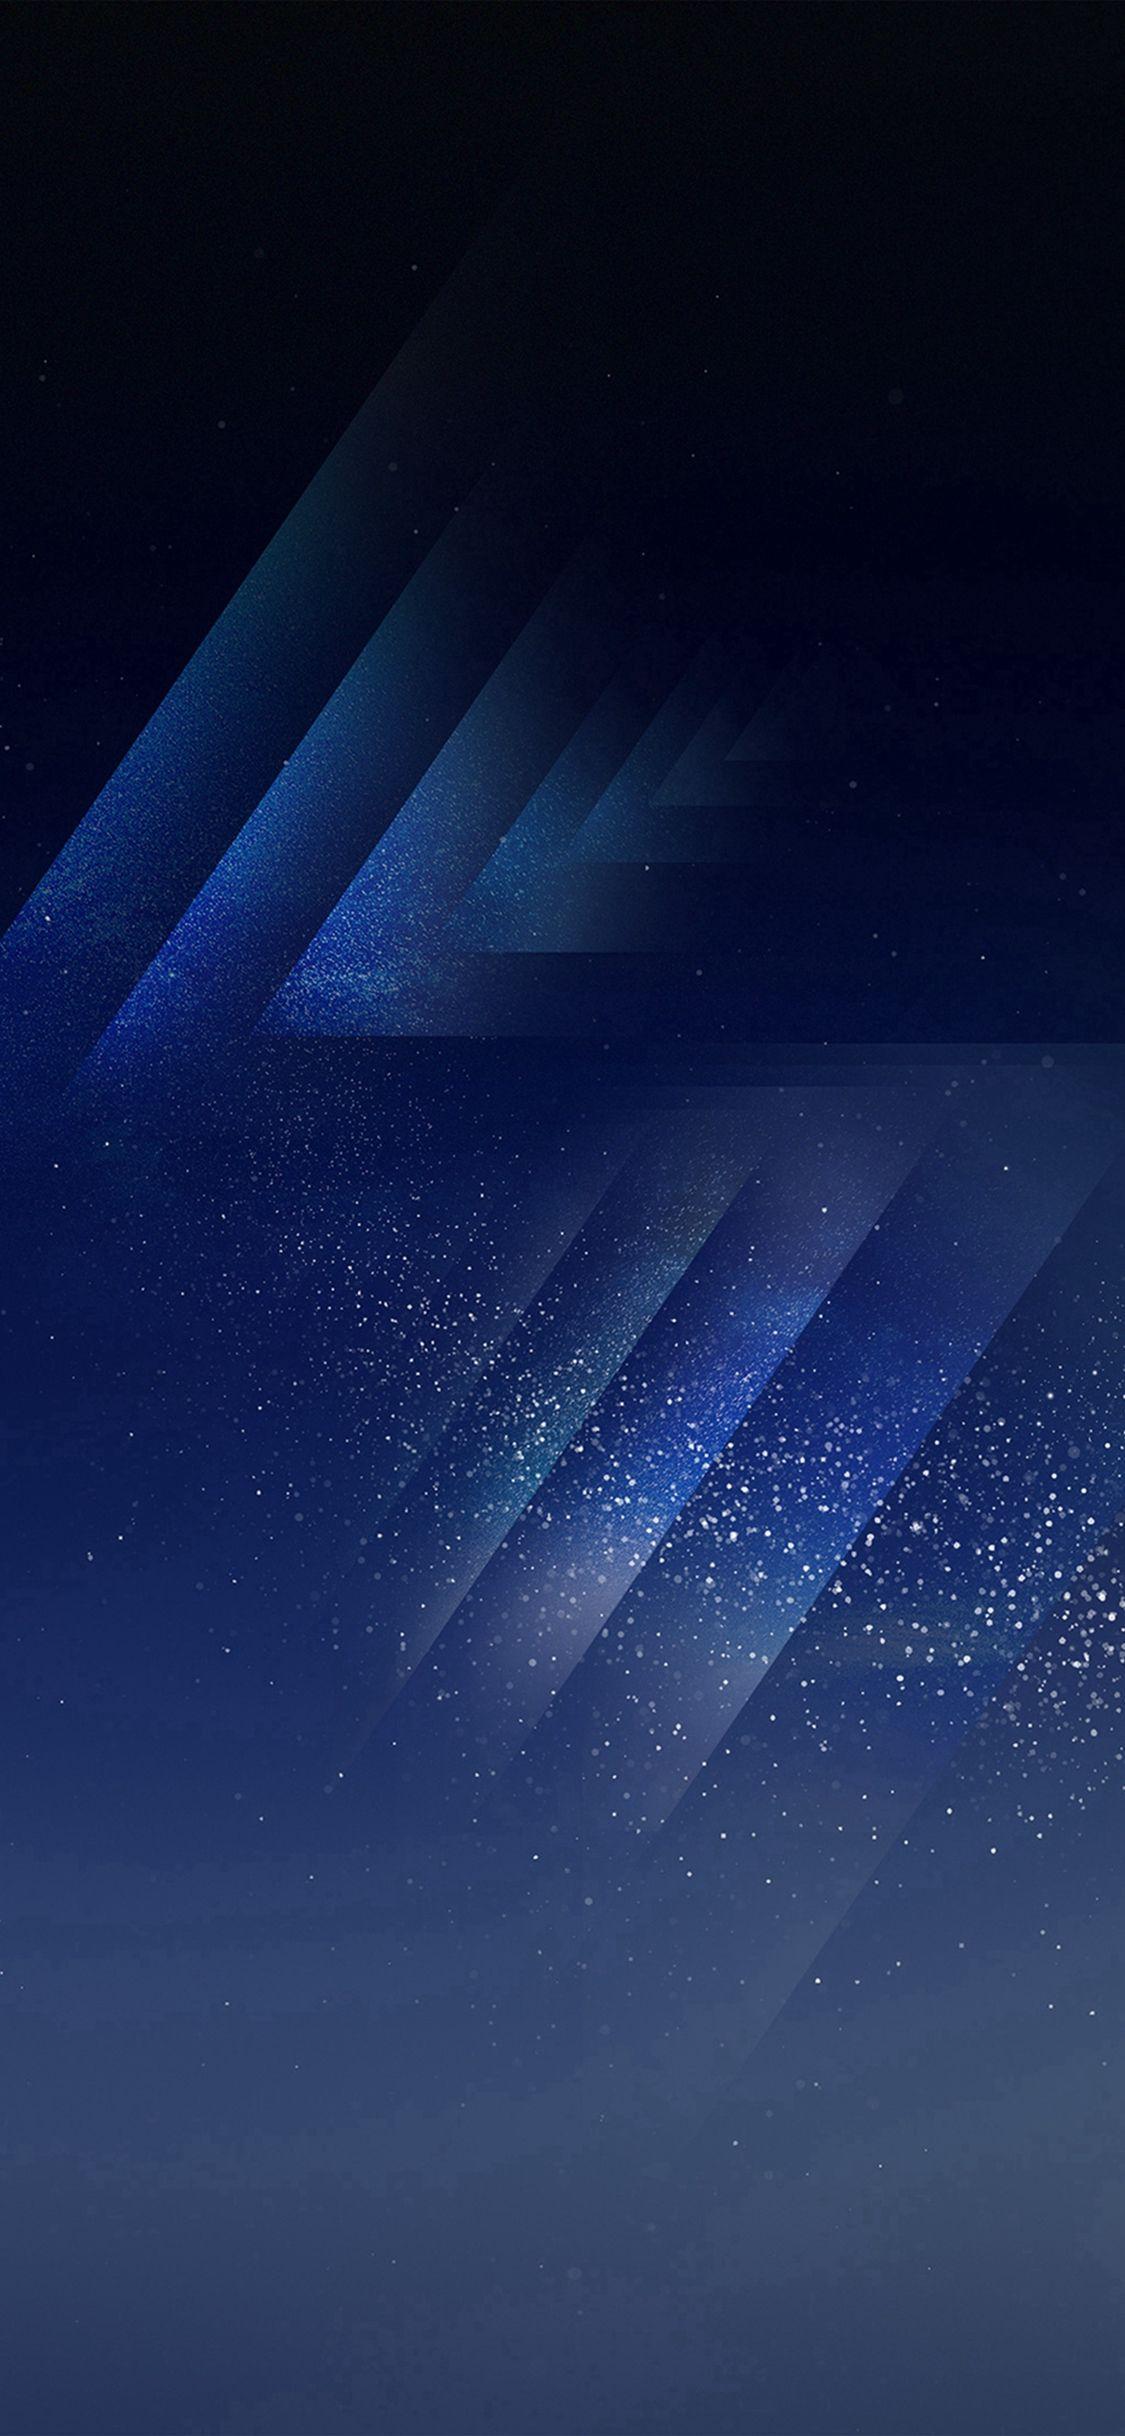 Galaxy S8 Android Dark Star Pattern Background Iphone X Wallpaper Galaxy Wallpaper Wallpaper Background Patterns